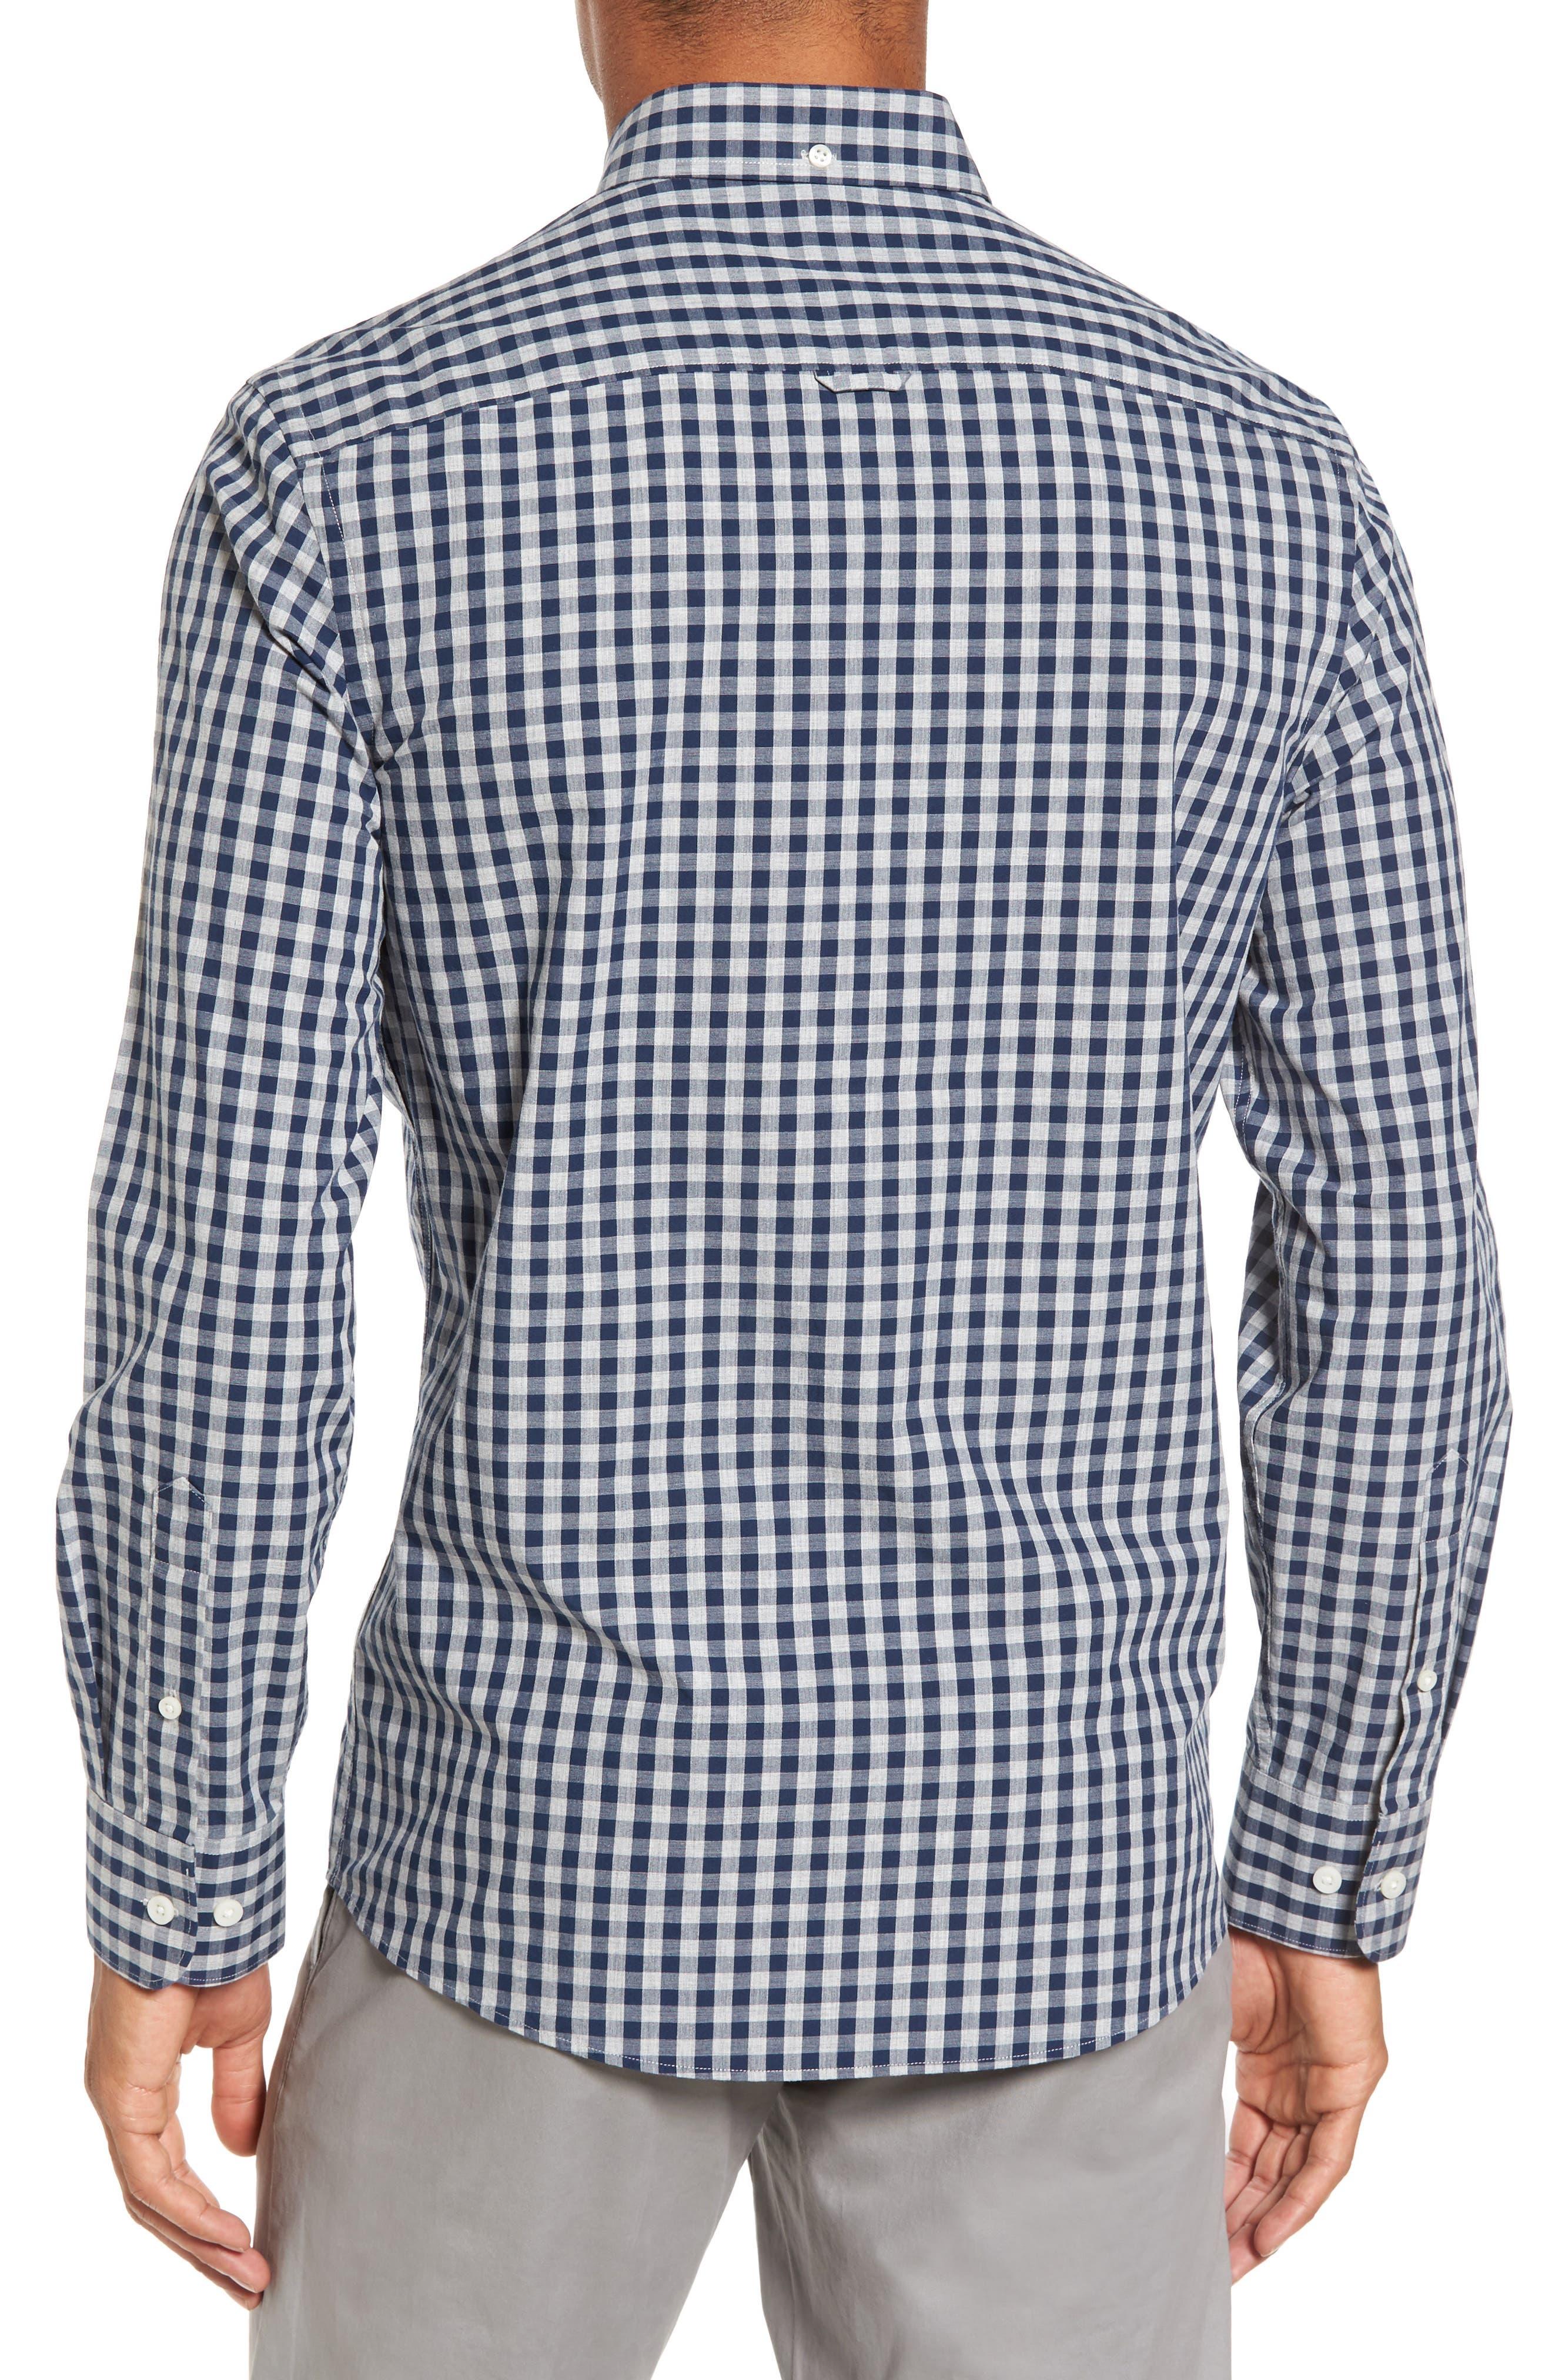 Spade Trim Fit Gingham Check Sport Shirt,                             Alternate thumbnail 3, color,                             Grey Shade Navy Gingham